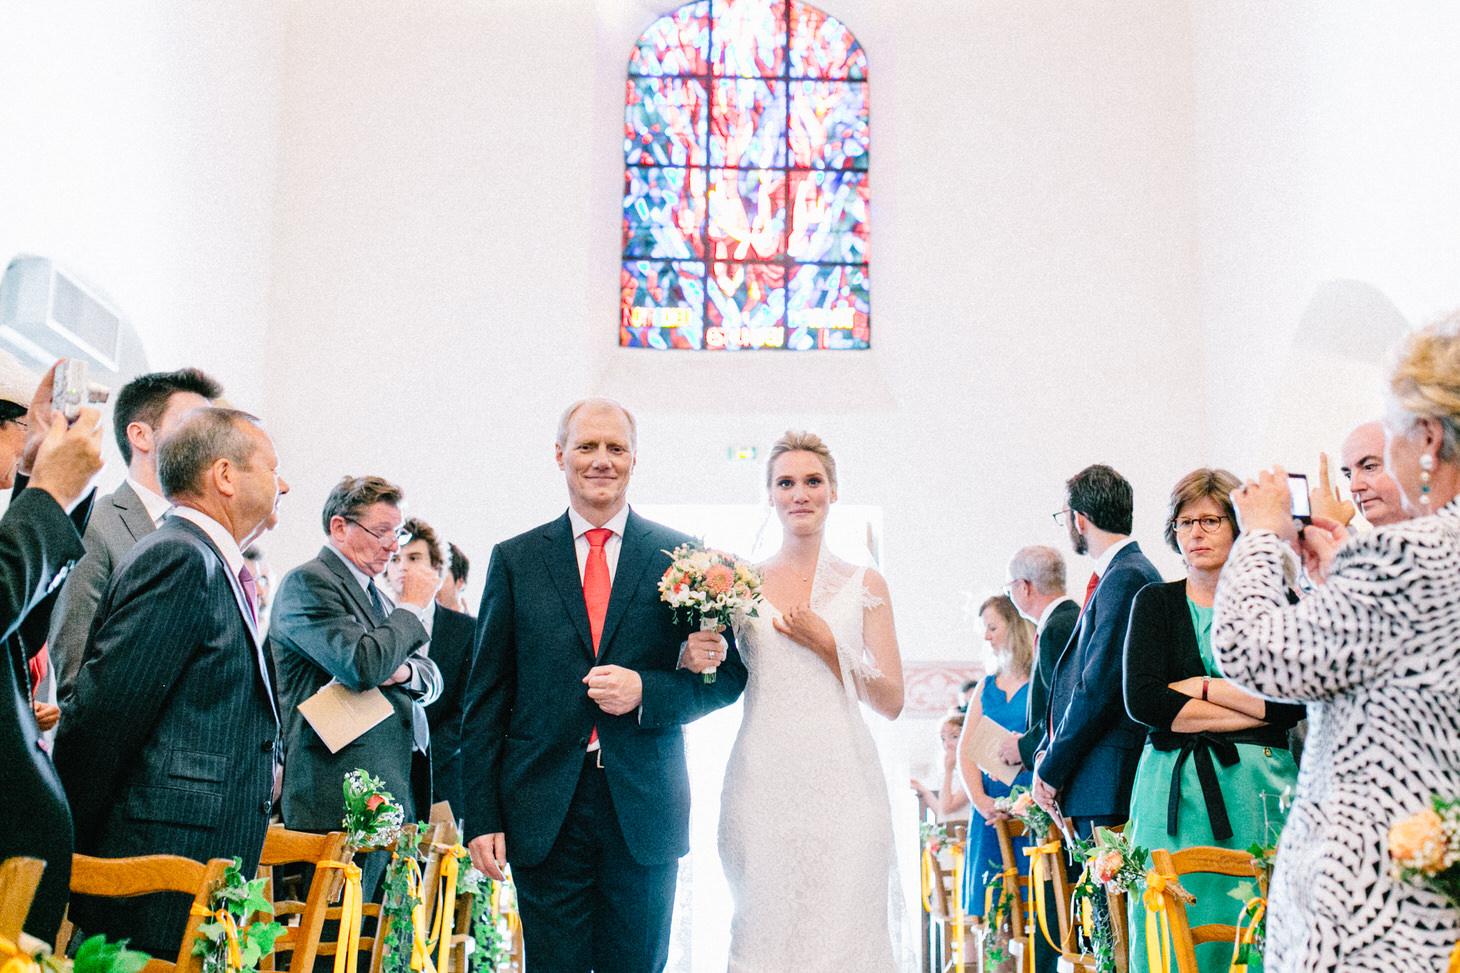 photographe-mariage-paris-montfort-l-amaury-025